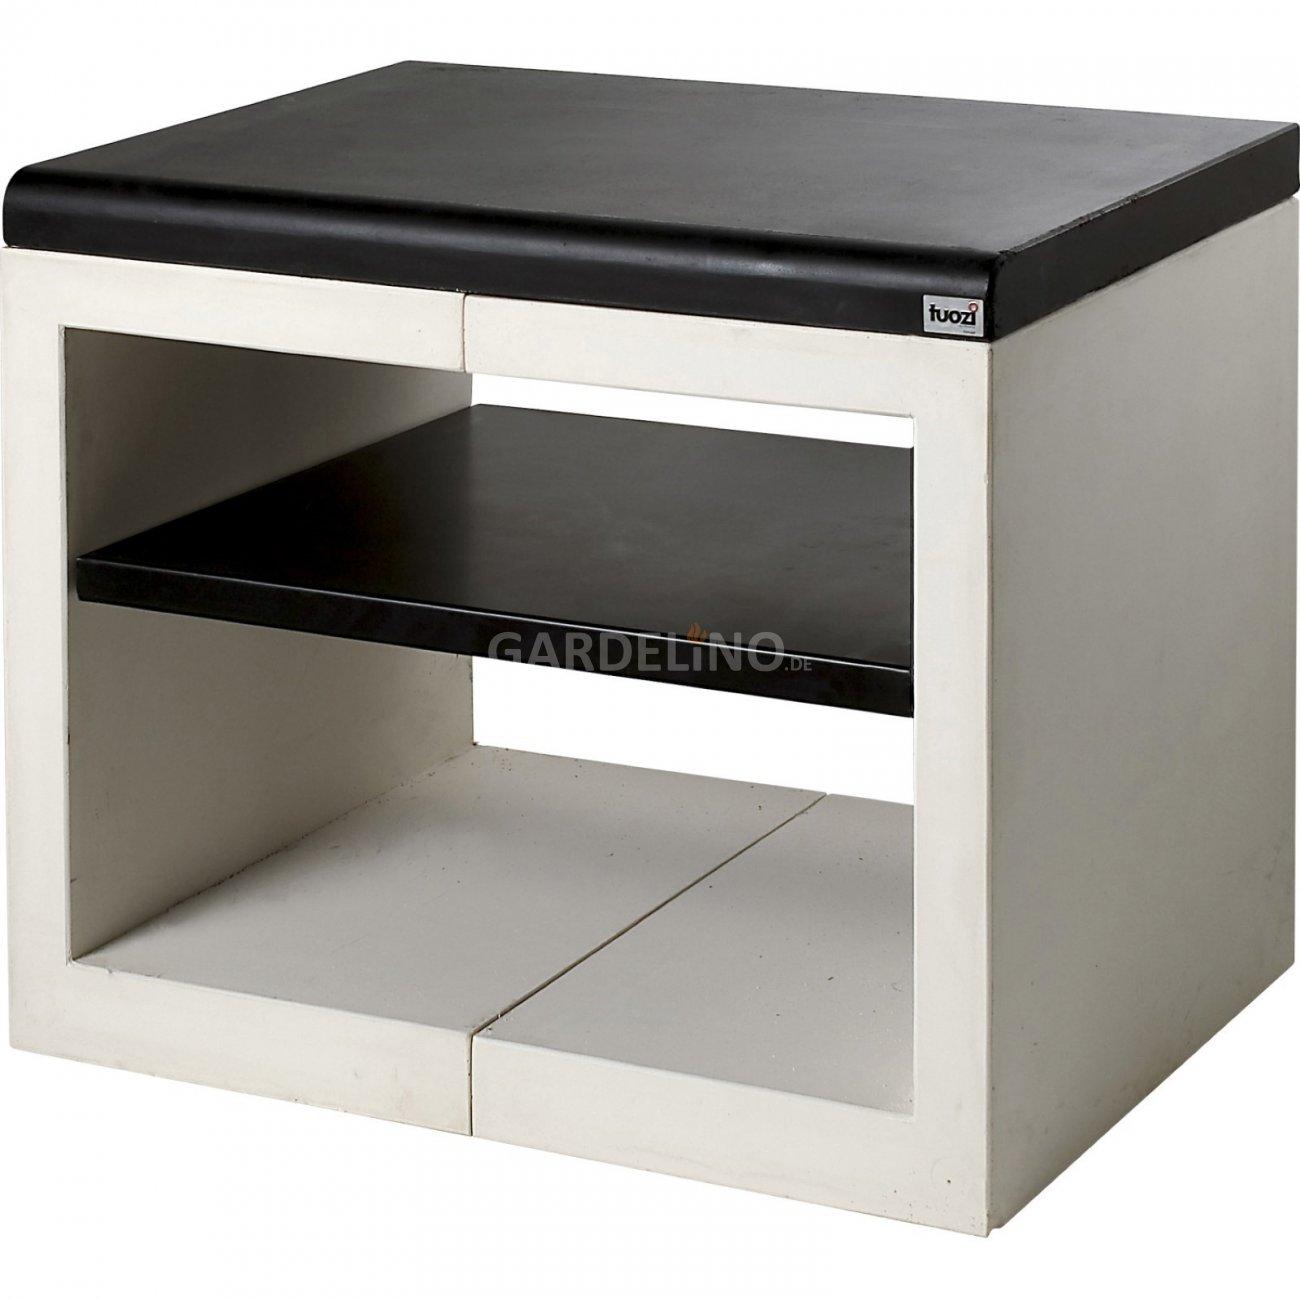 grillkamin beistelltisch kitaway outdoork che. Black Bedroom Furniture Sets. Home Design Ideas